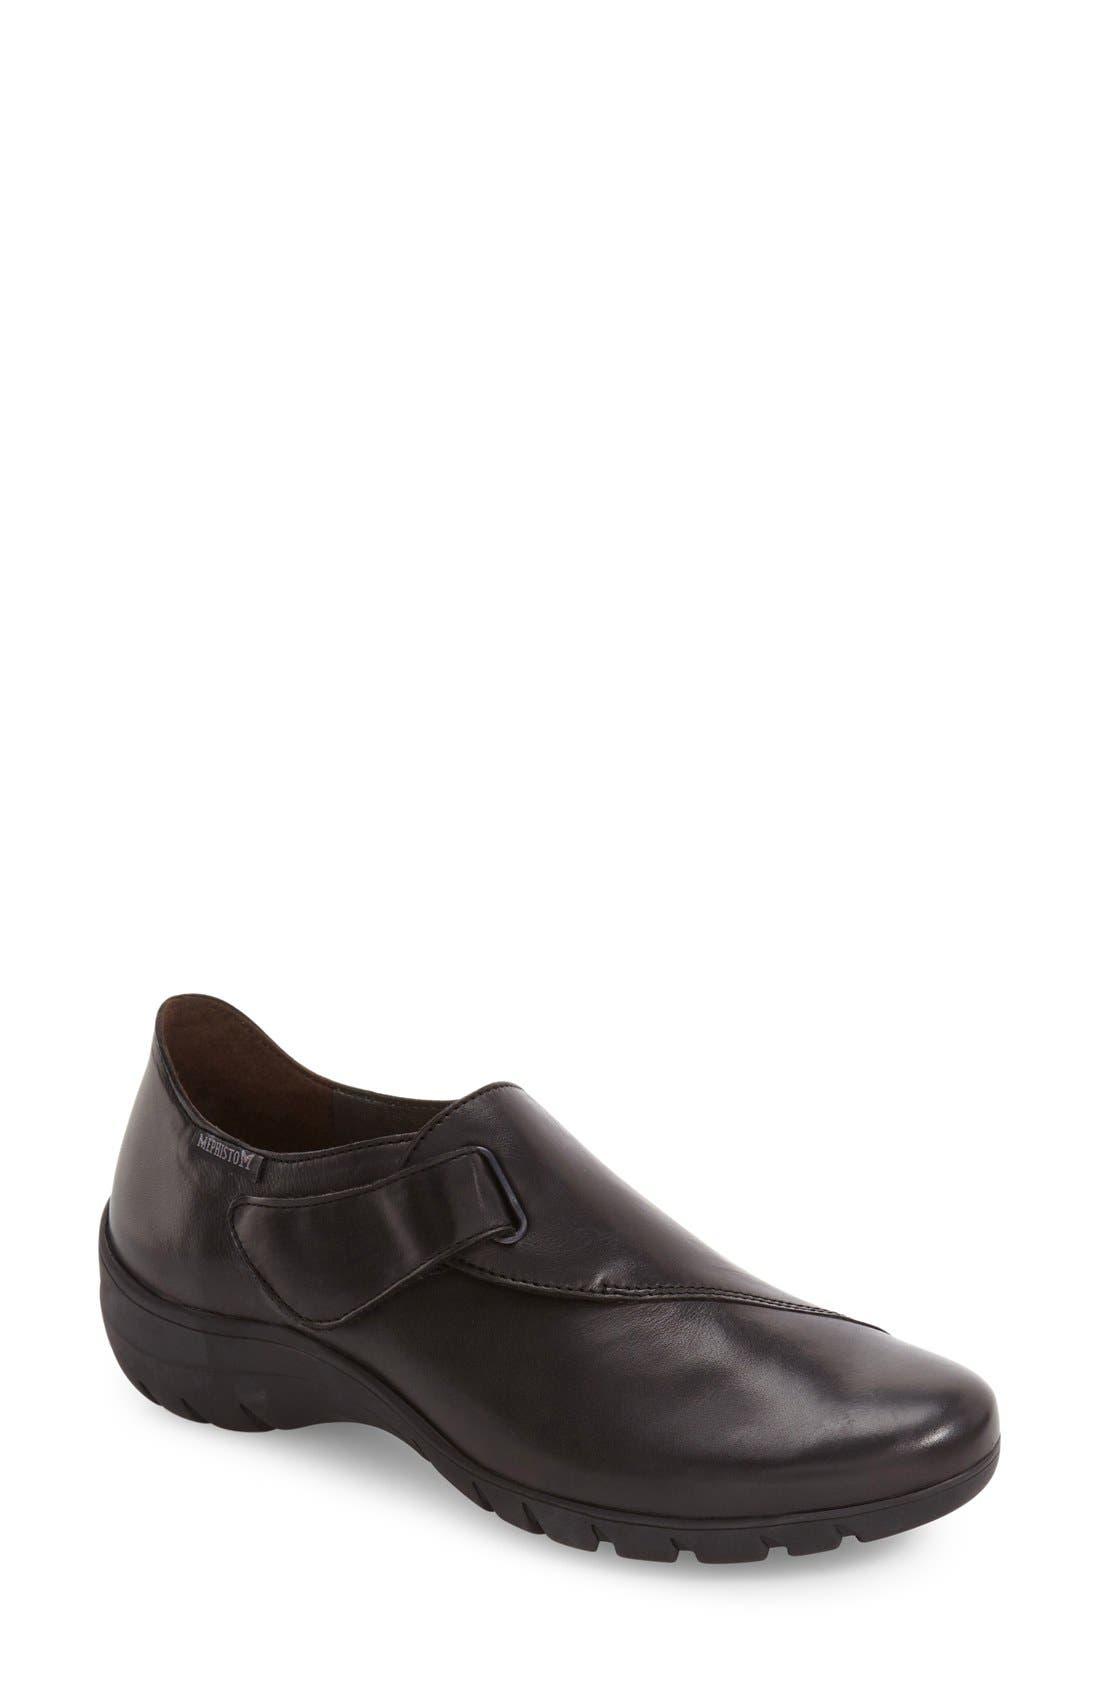 'Luce' Sneaker,                         Main,                         color, Black Silk Leather